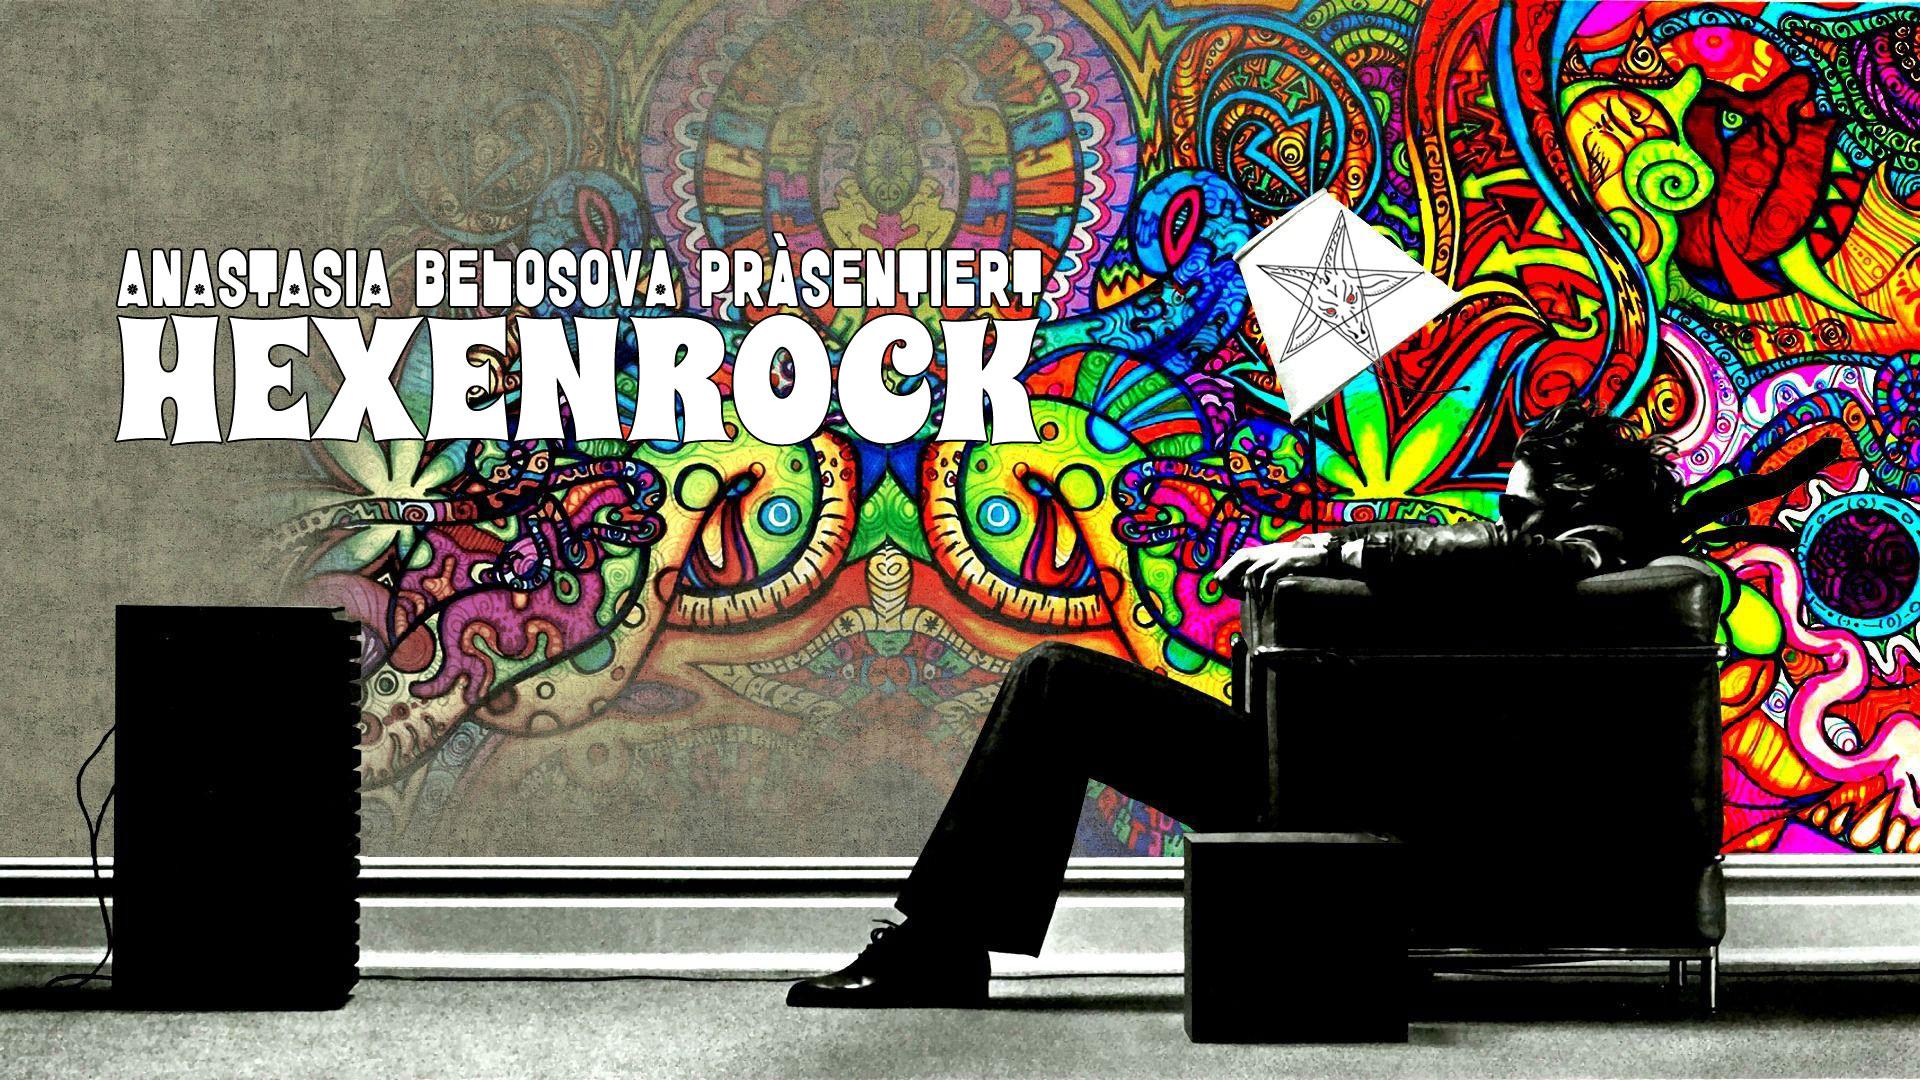 HEXENROCK mit ANASTASIA BELOSOVA